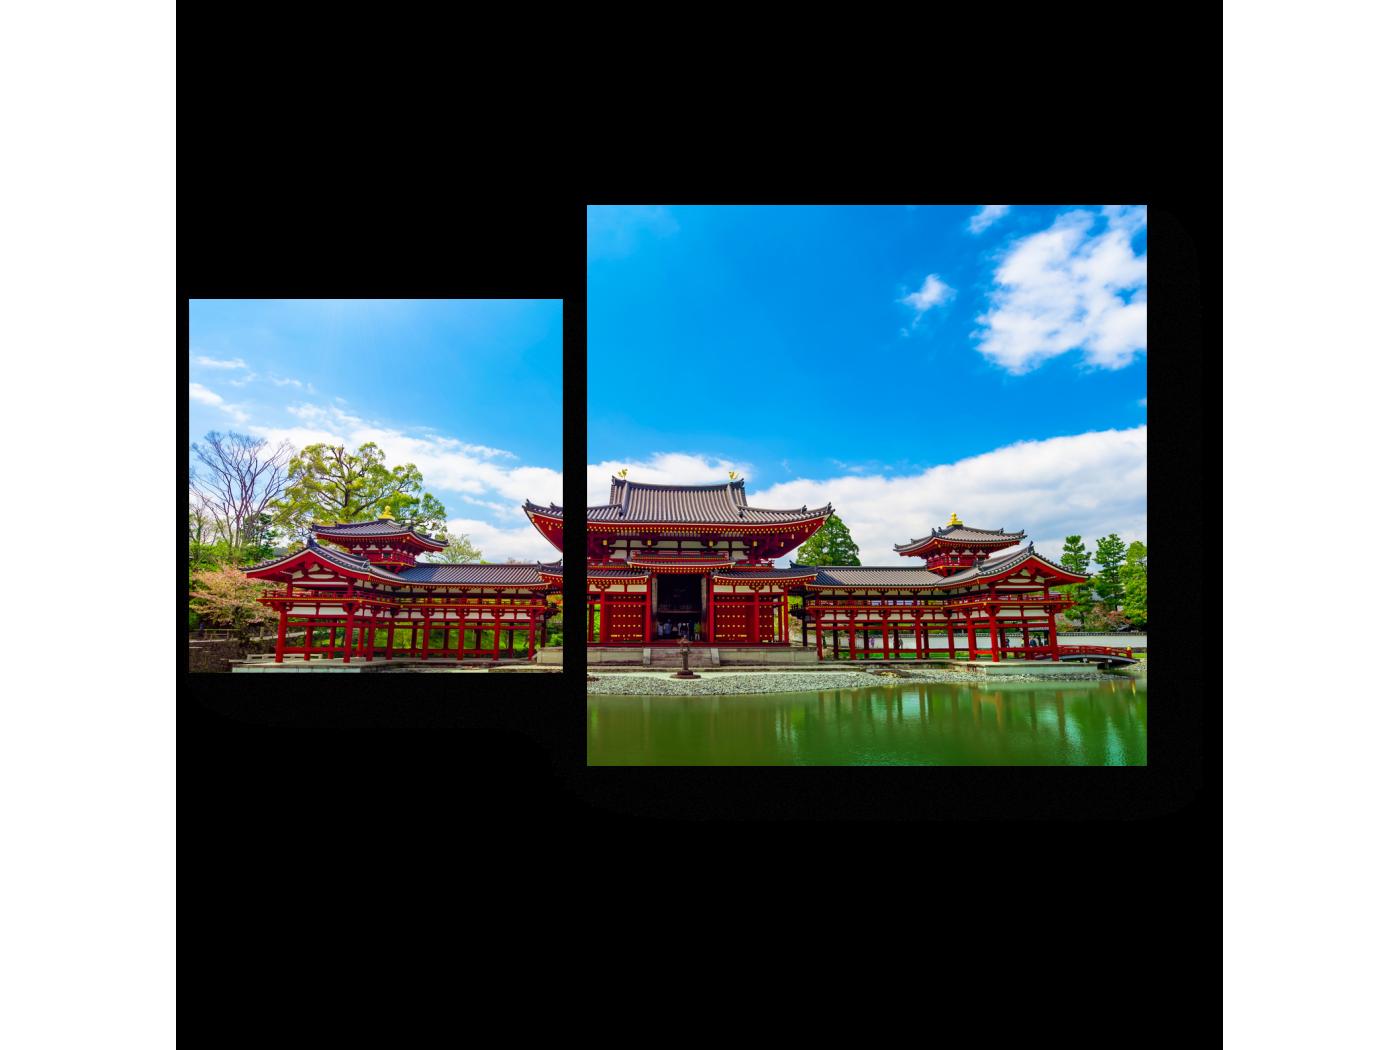 Модульная картина Храм Биодо, Киото (50x30) фото